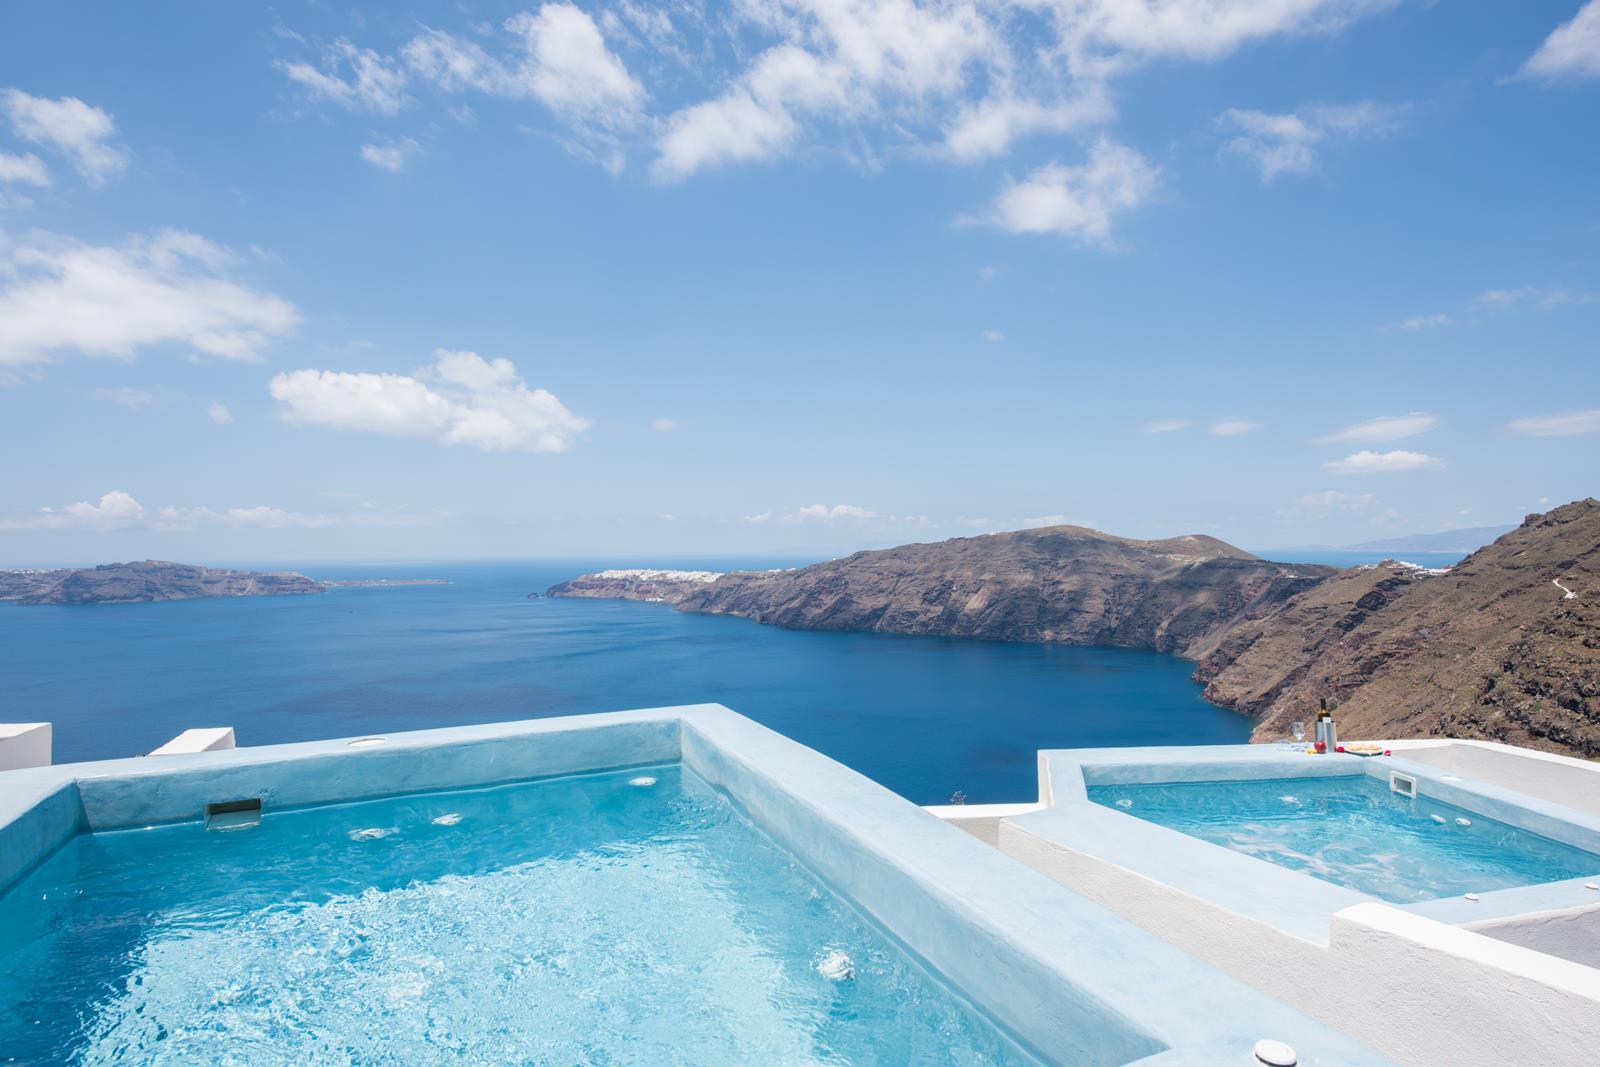 imerovigli santorini hotels - Gizis Exclusive Santorini Greece